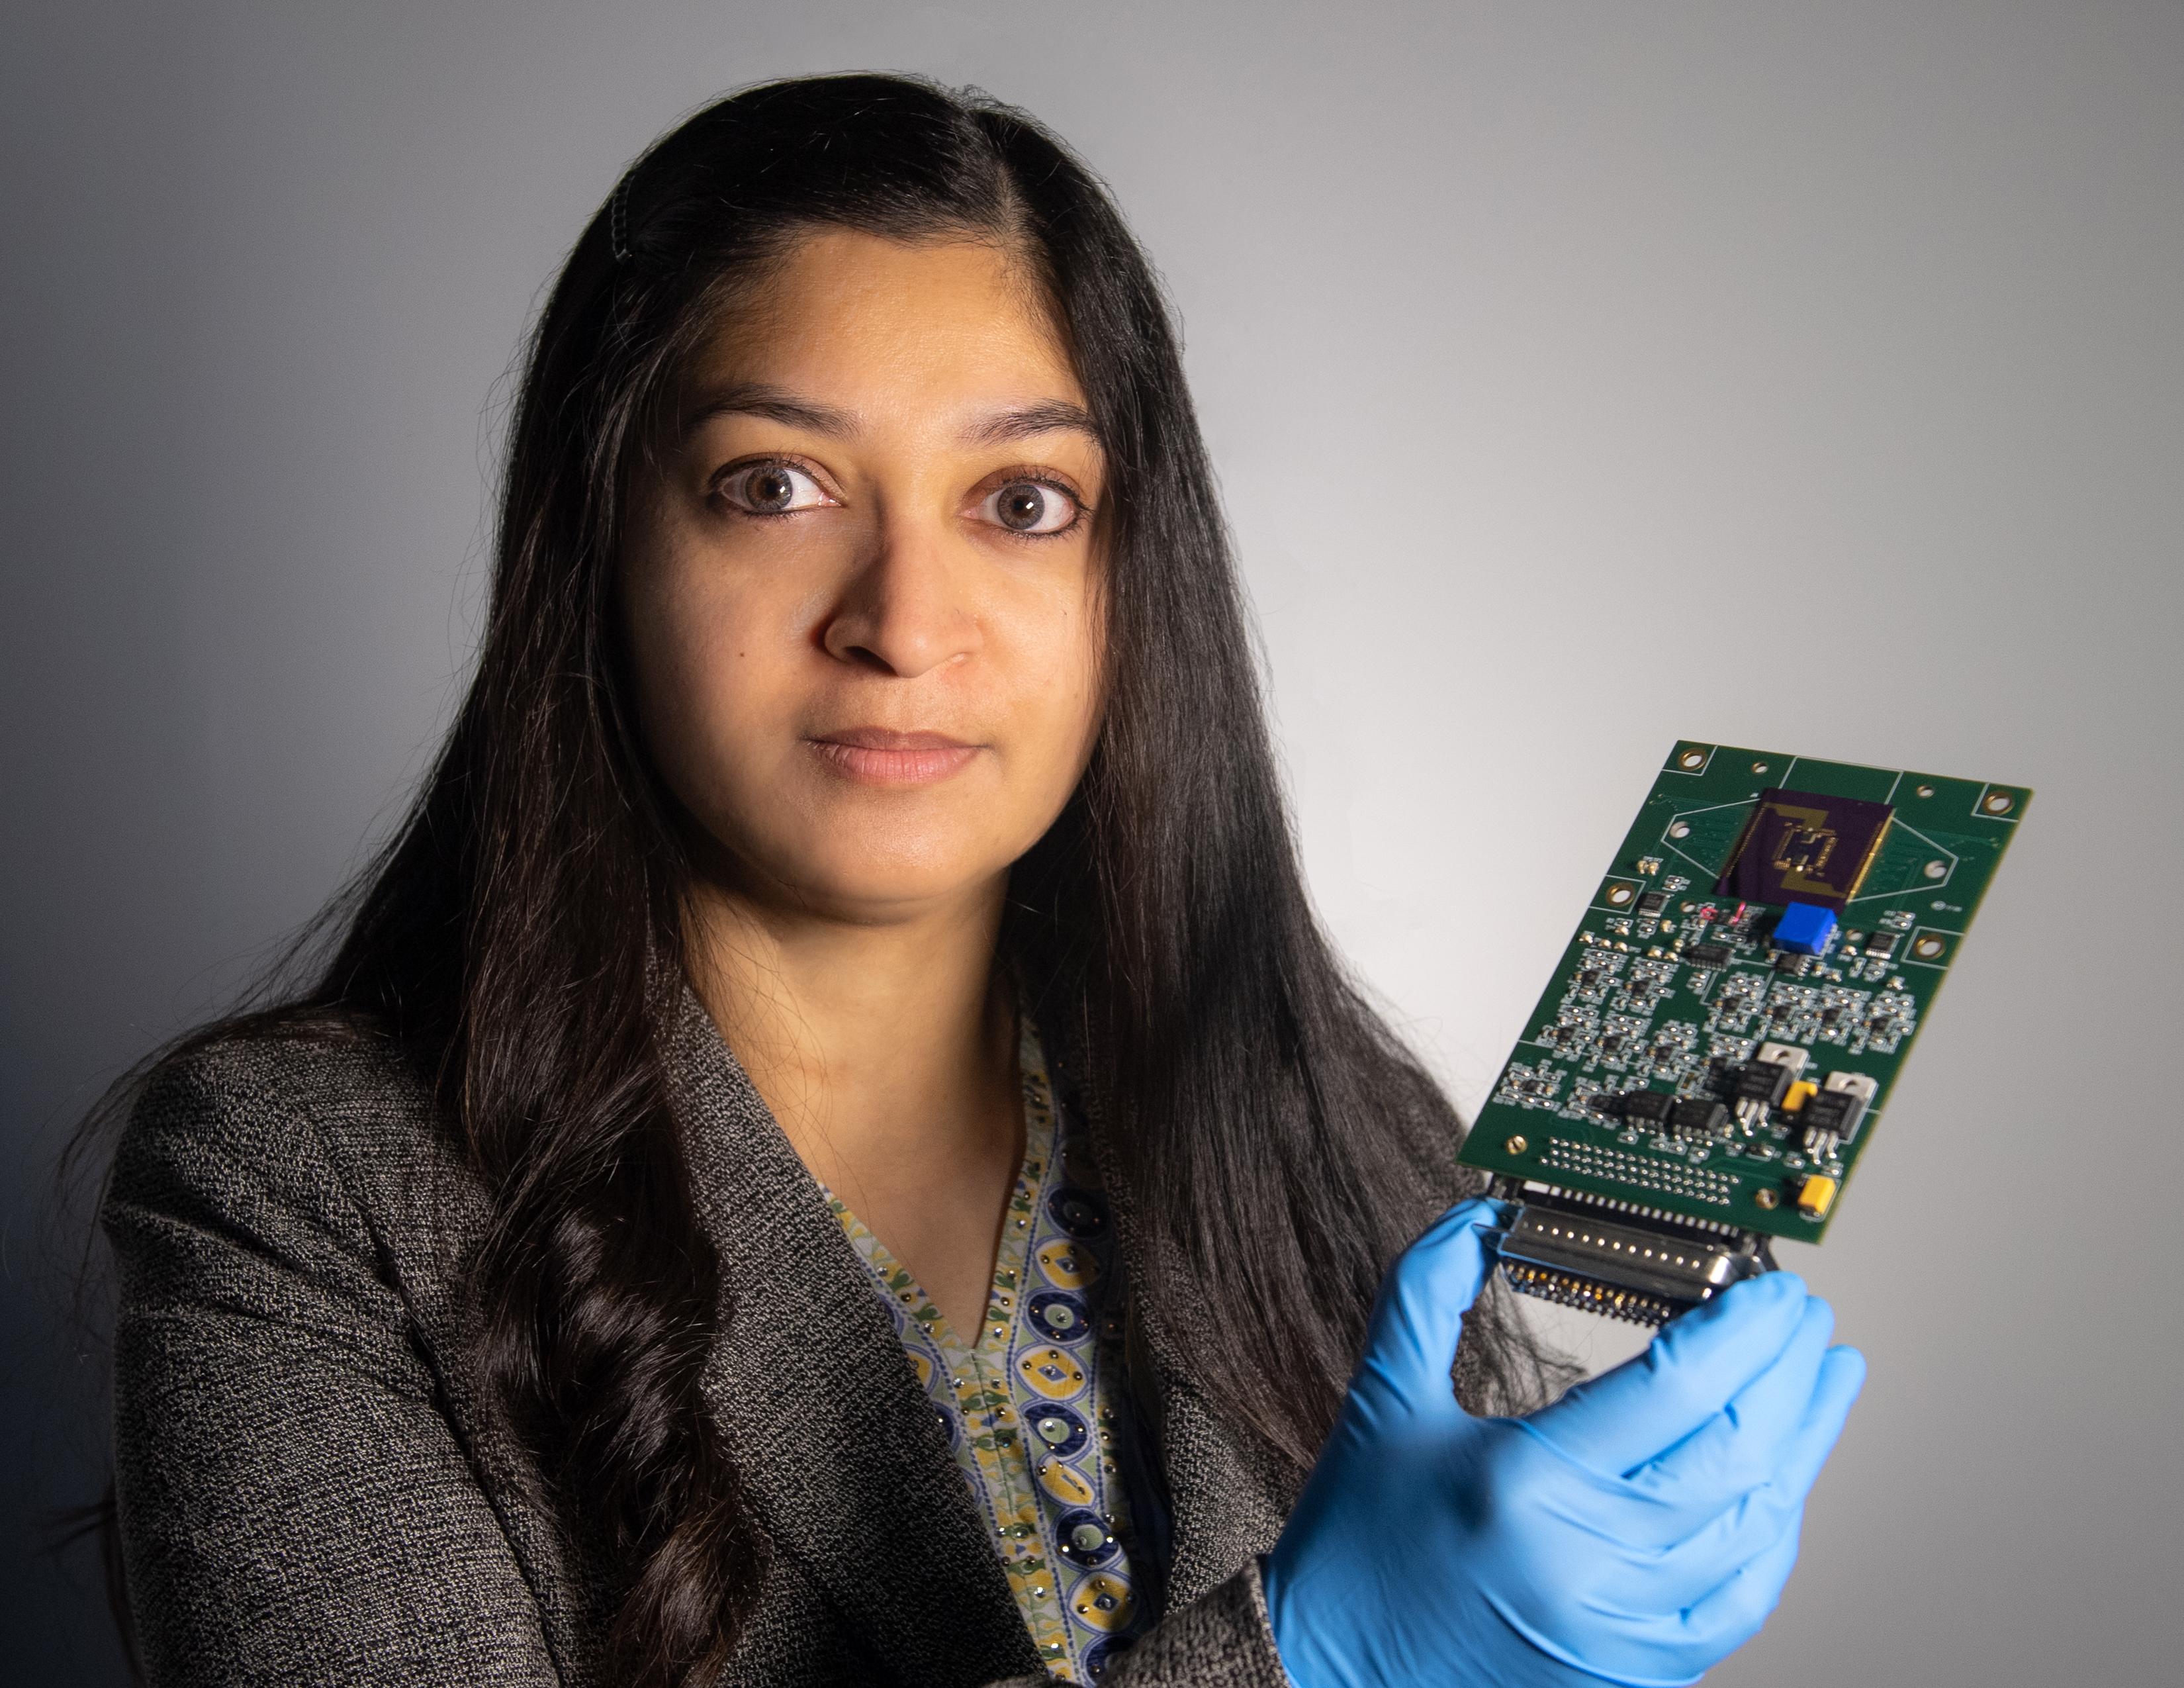 Mahmooda Sultana holding a multifunctional sensor platform. Image via NASA.